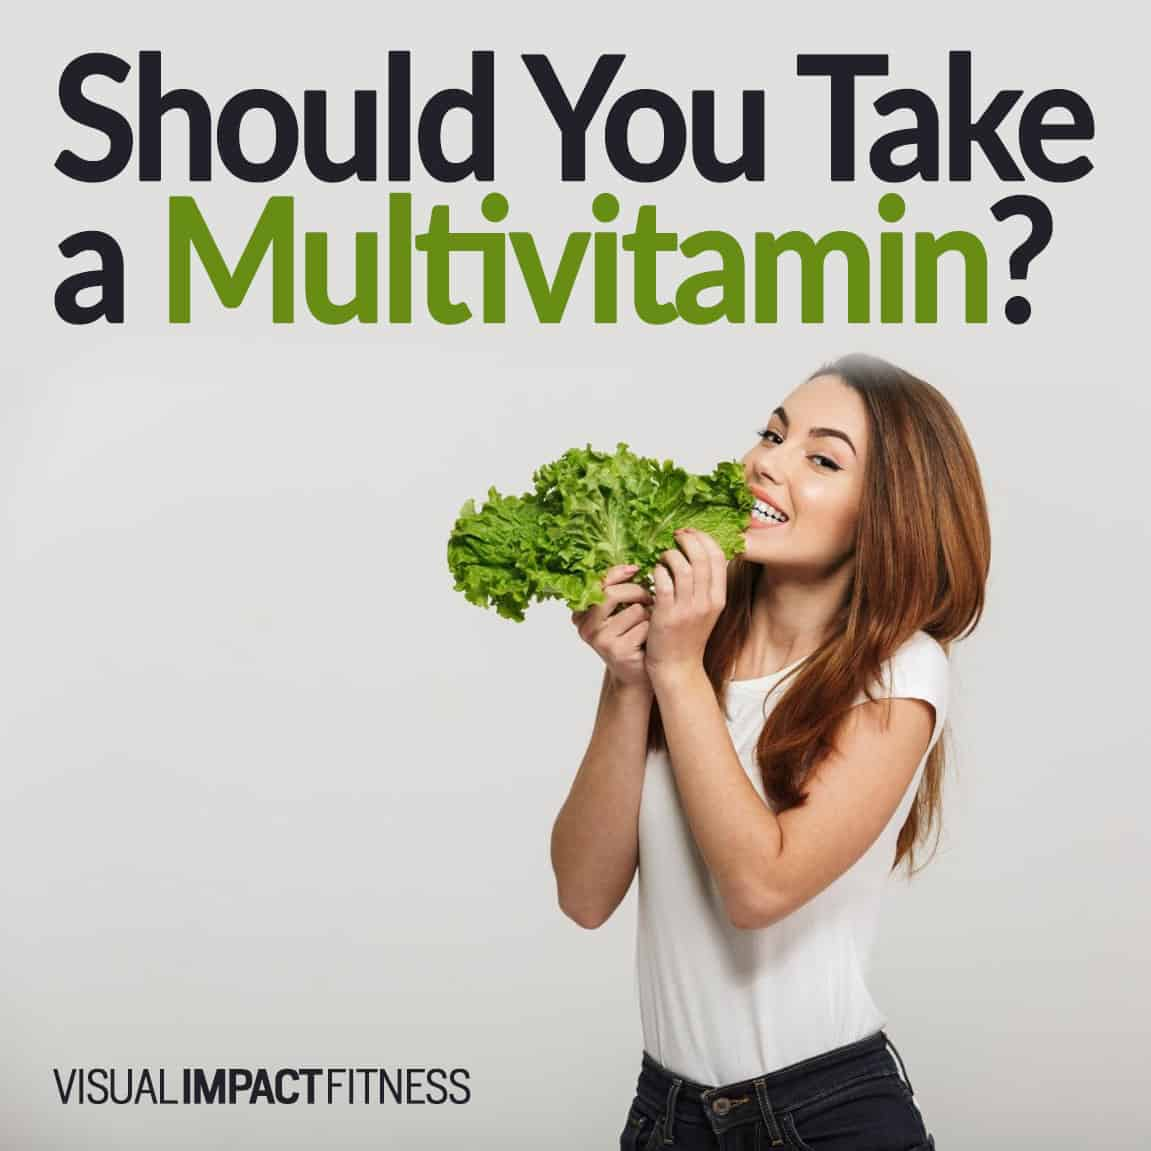 Should You Take a Multivitamin?